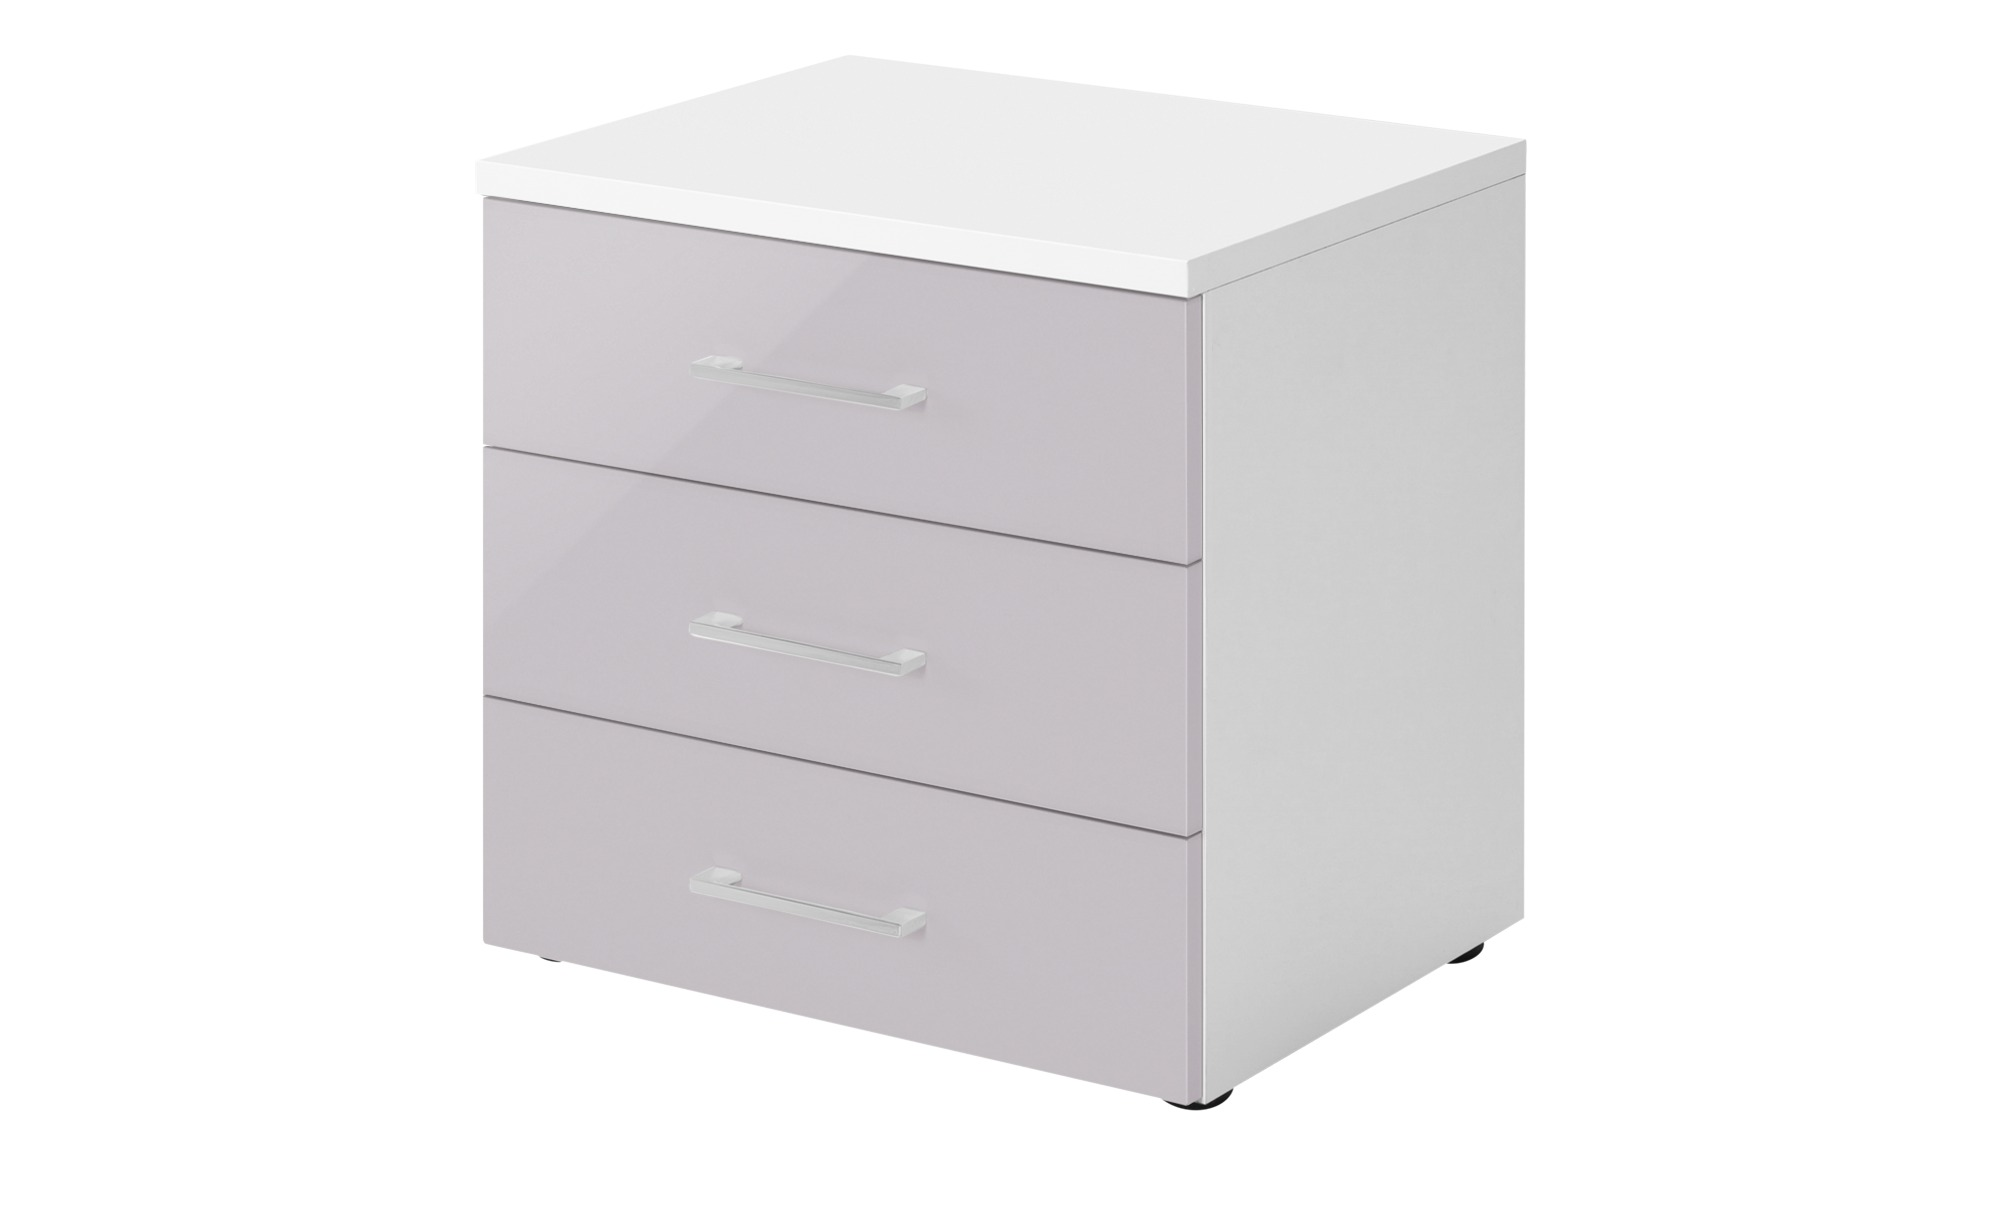 nachtkommode colors breite 50 cm h he 52 cm grau online kaufen bei woonio. Black Bedroom Furniture Sets. Home Design Ideas